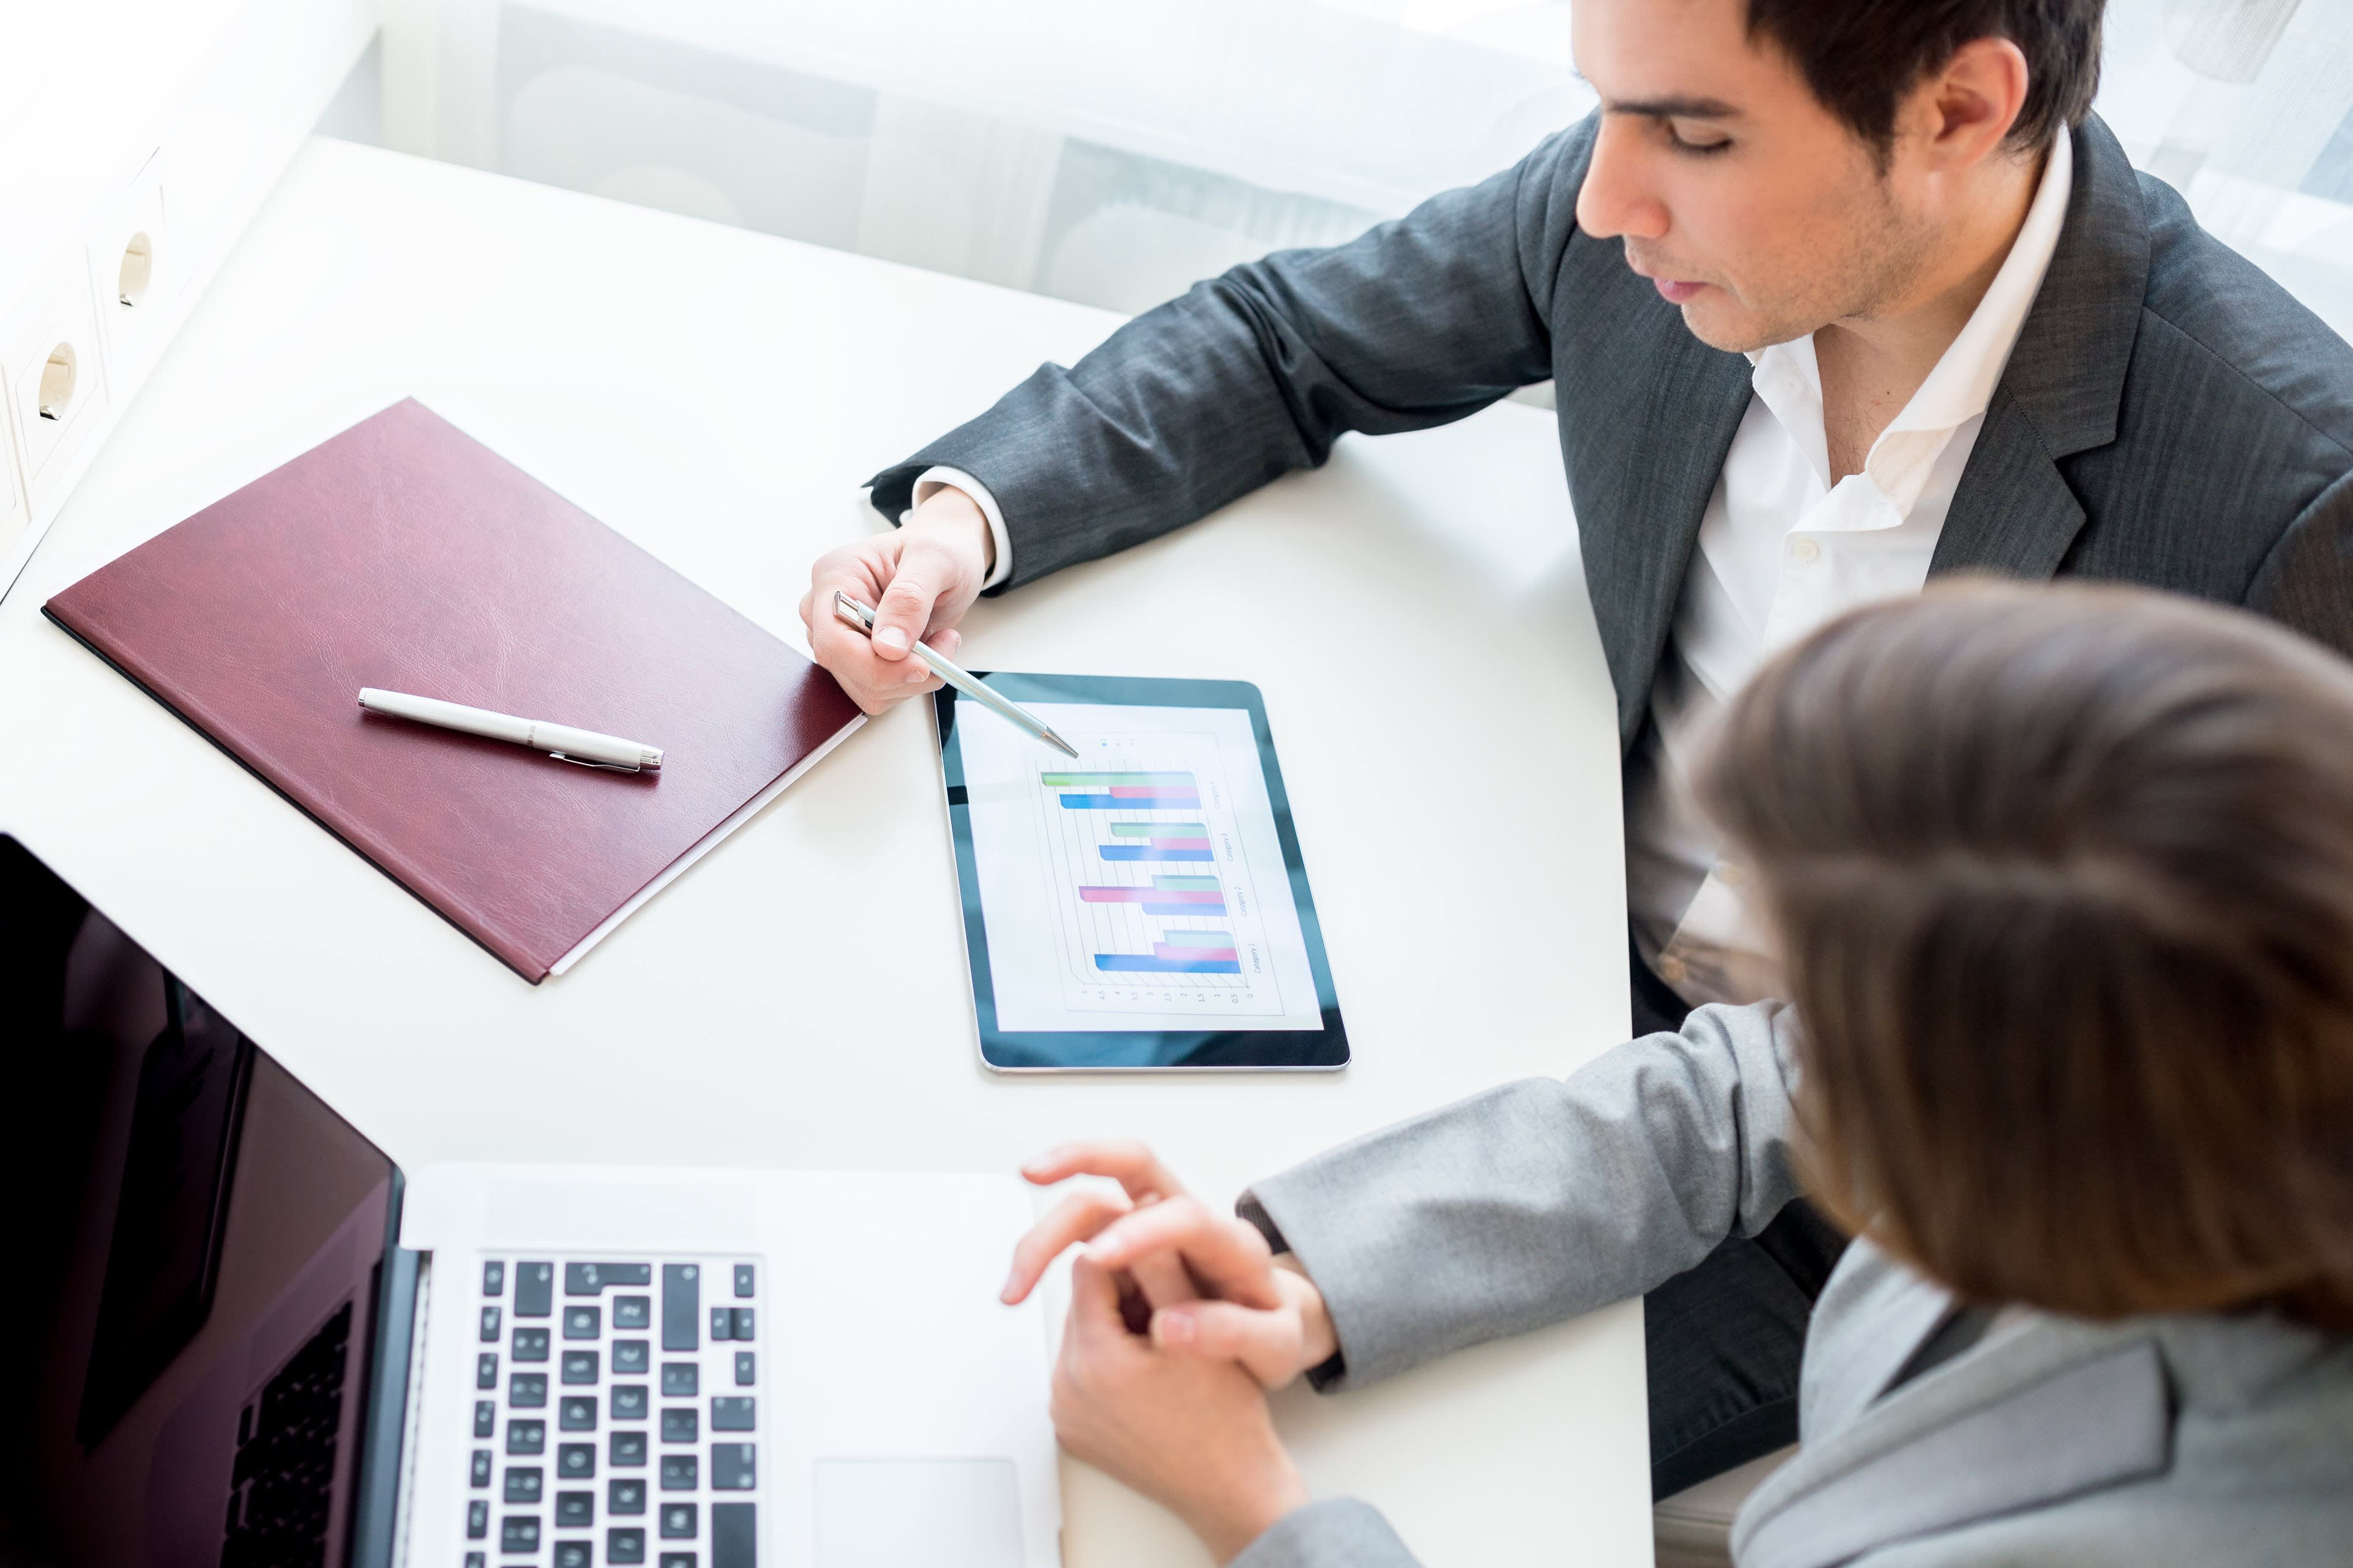 Premier Miton launches adviser platform